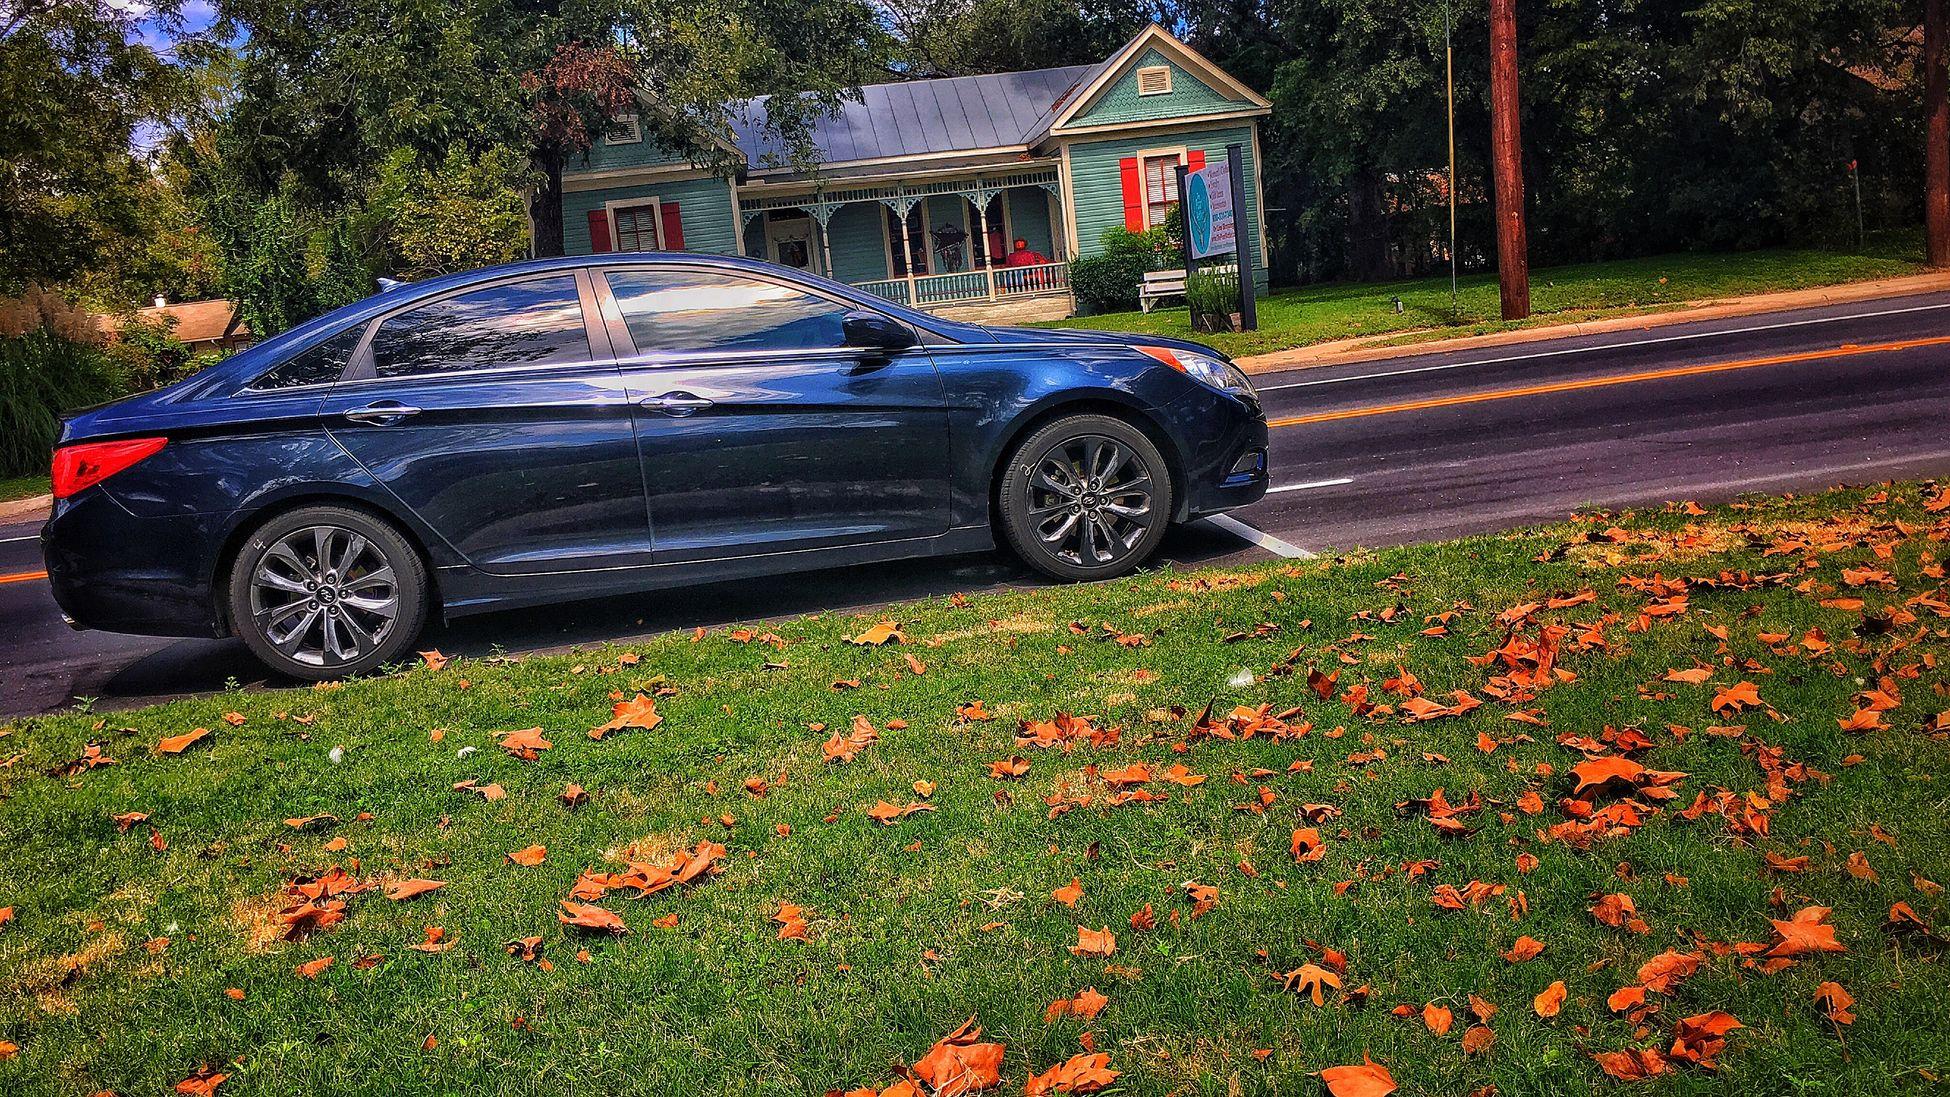 Car portrait IPhone 6s Plus IPhoneography IPhone Texas Boerne Car Fall Season Boerne River Park